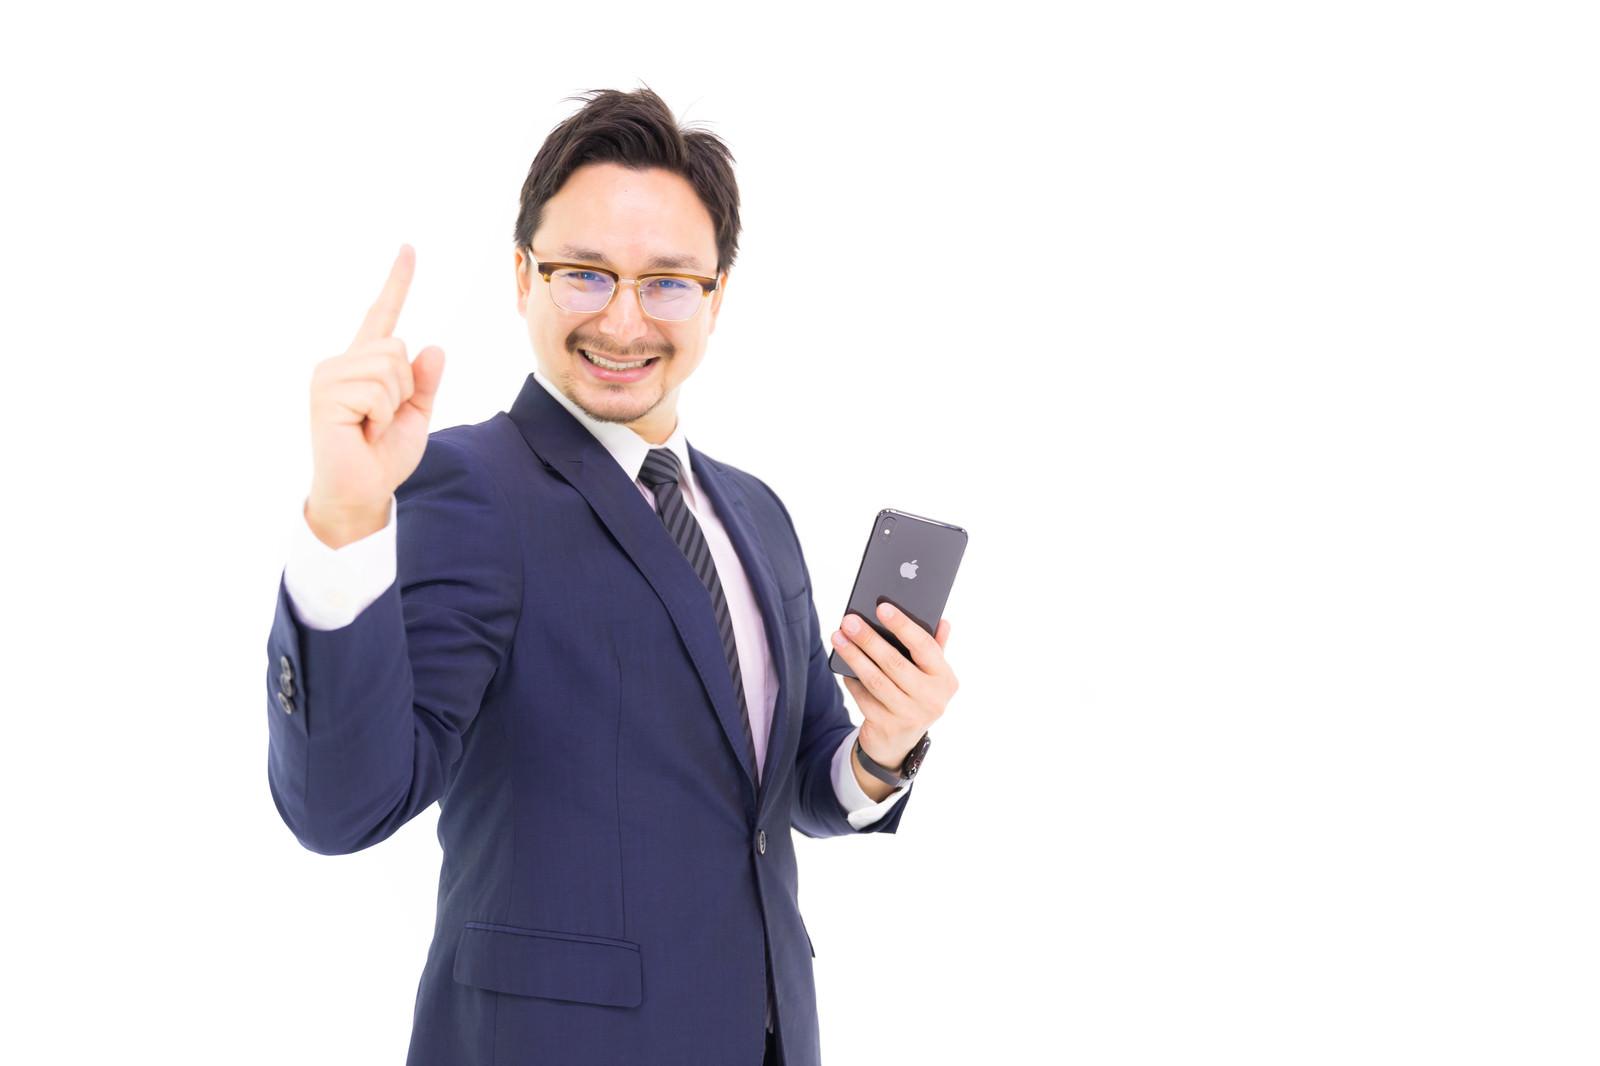 「iPhone Xs Max は最高だと応援するドイツ人ハーフ」の写真[モデル:Max_Ezaki]